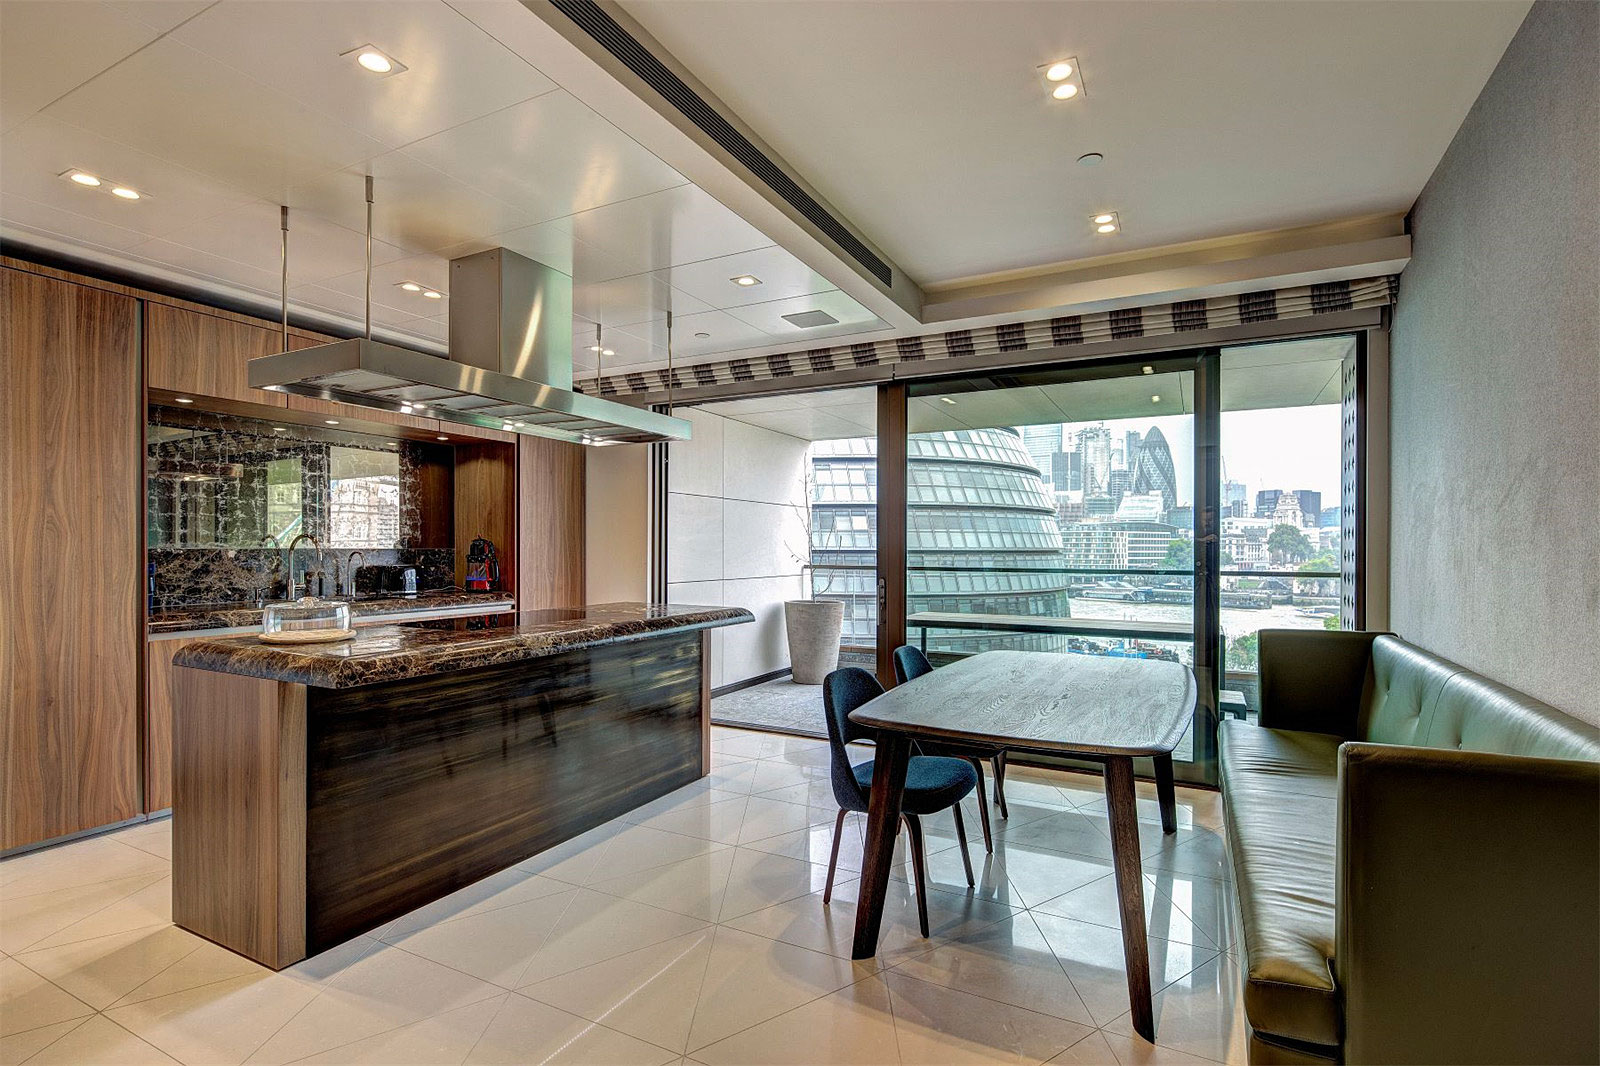 Blenheim House, One Tower Bridge, London, United Kingdom | Shereen Malik, United Kingdom Sotheby's International Realty |FINEST RESIDENCES - 4